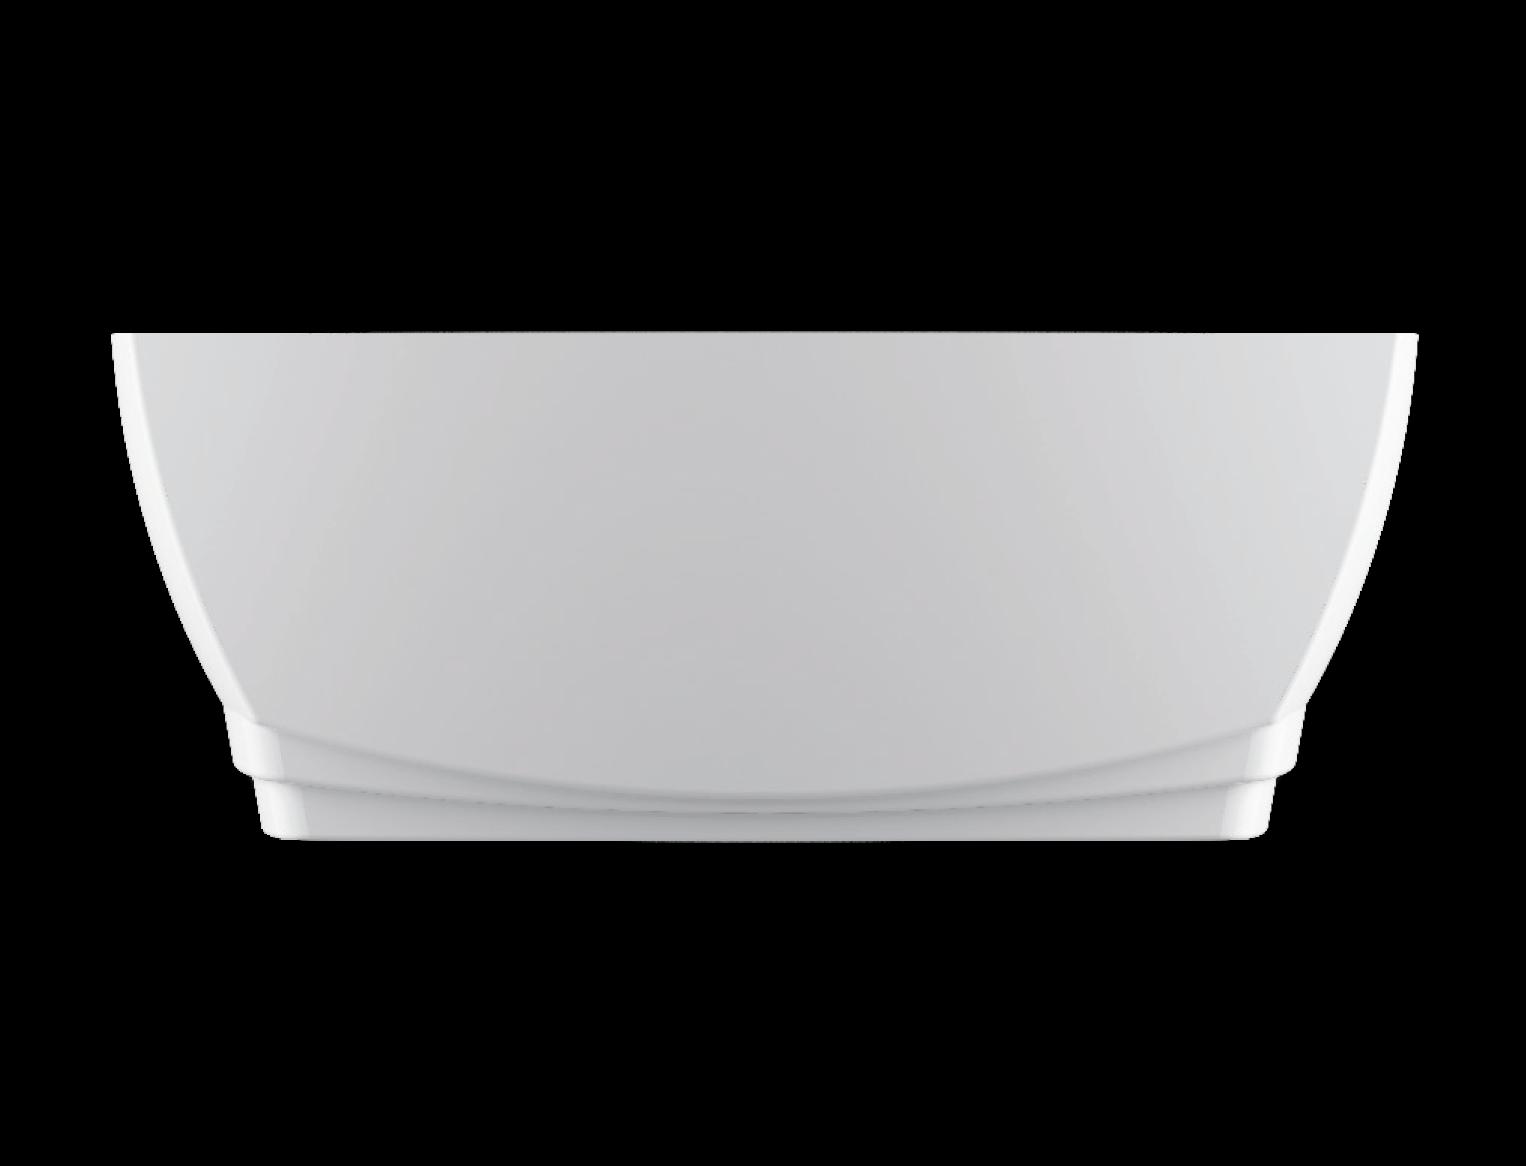 Bainultra Esthesia 6436 freestanding air jet bathtub for your master bathroom